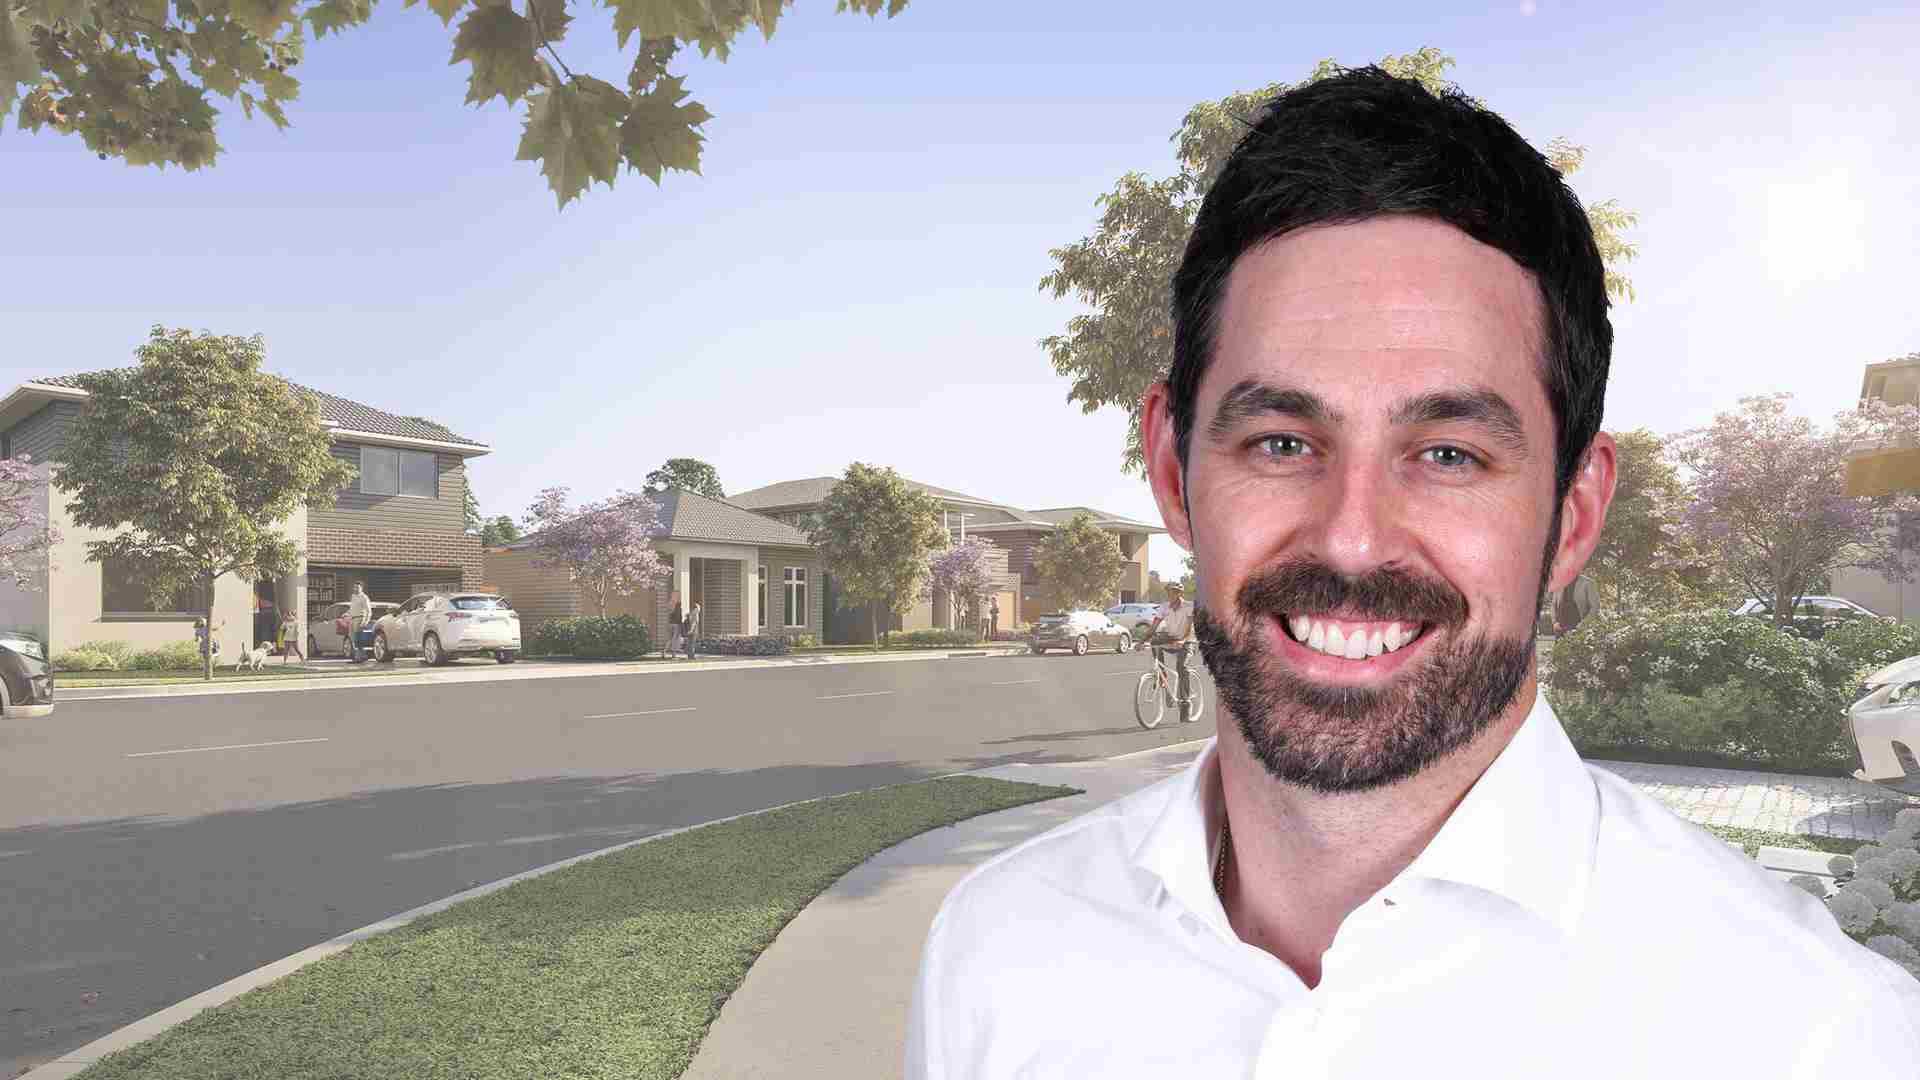 Expert in Focus - Steve Barlow